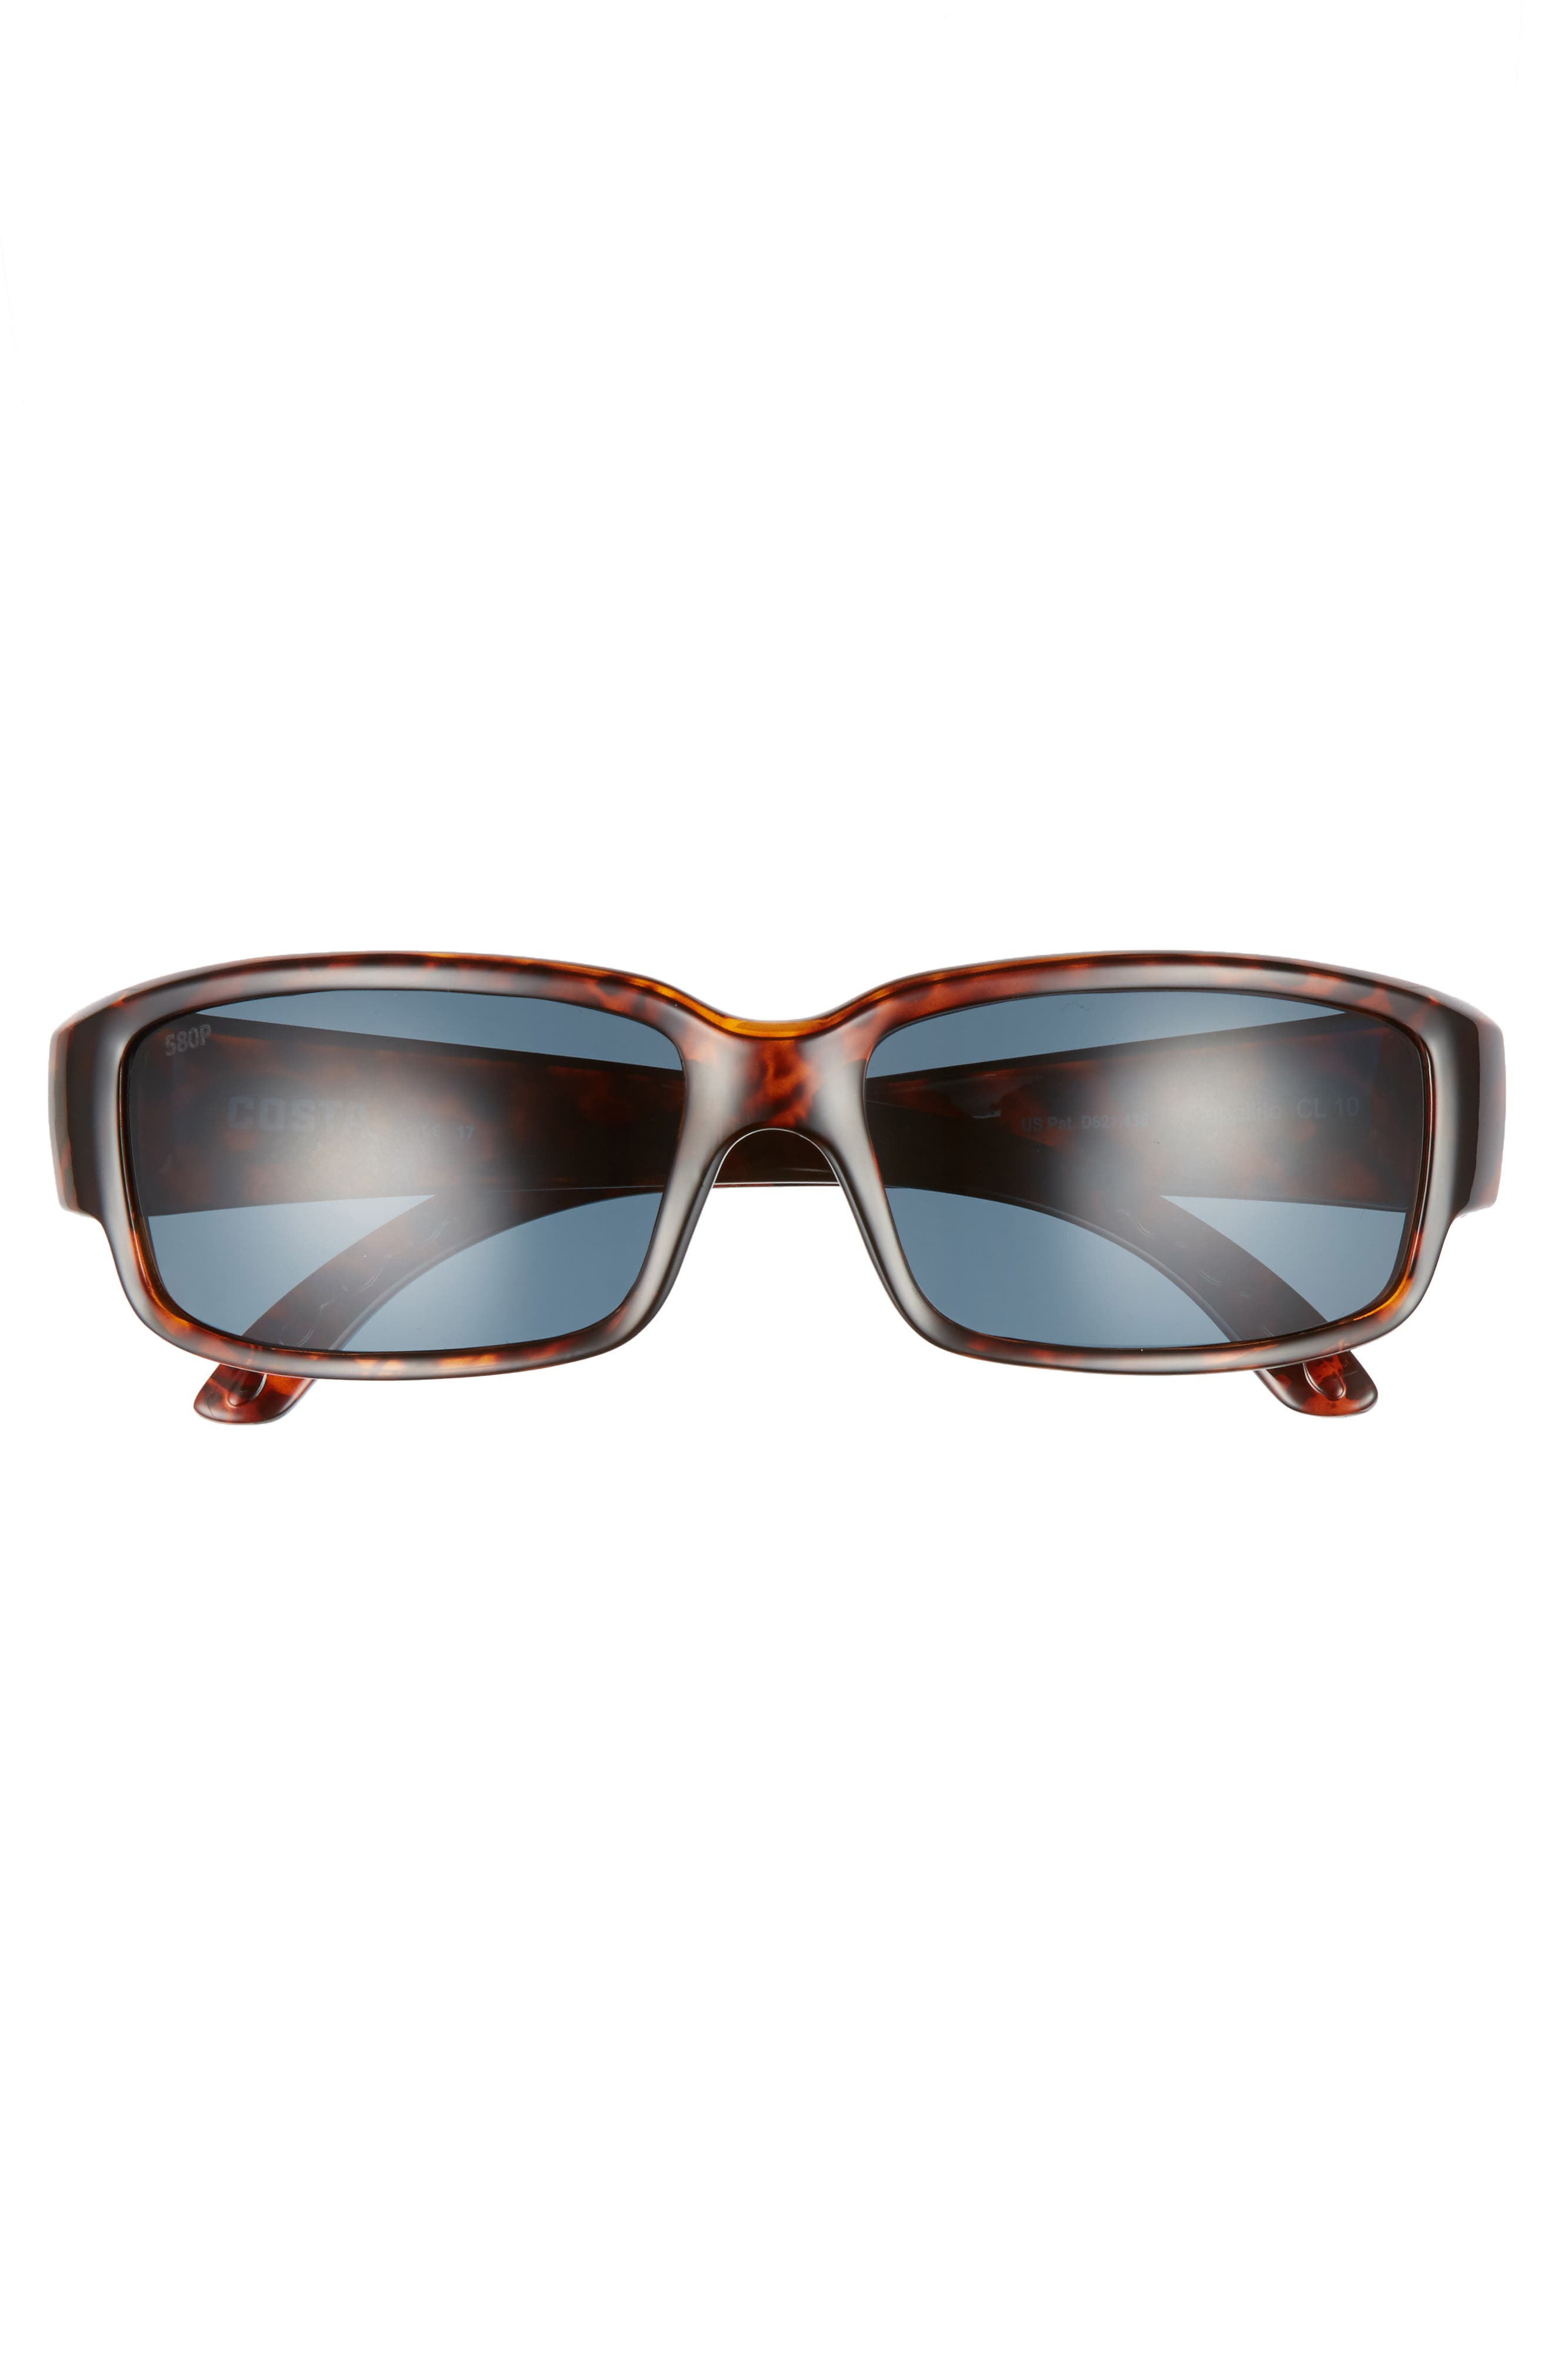 Caballito 60mm Polarized Sunglasses,                             Alternate thumbnail 2, color,                             Tortoise/ Grey